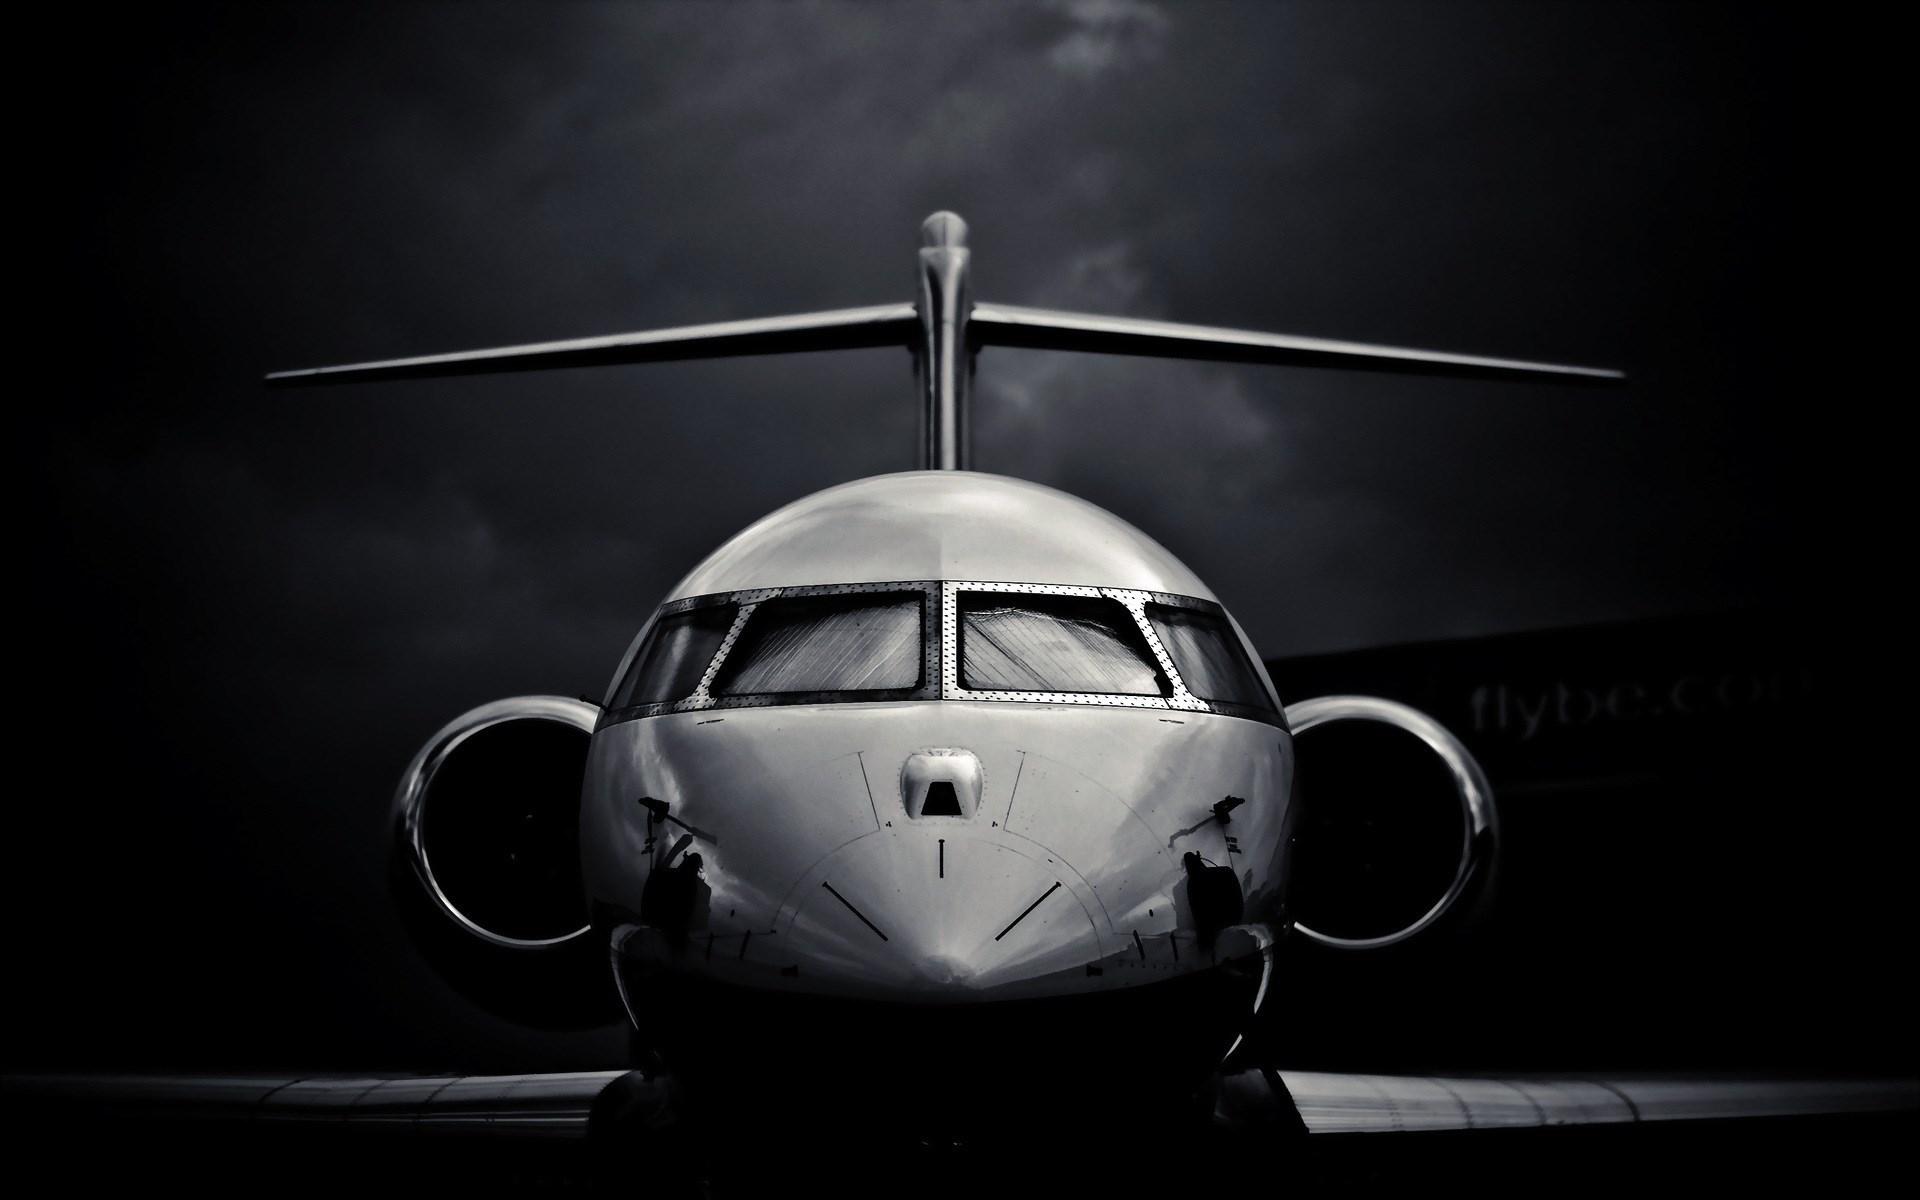 airplane-hd-wallpaper